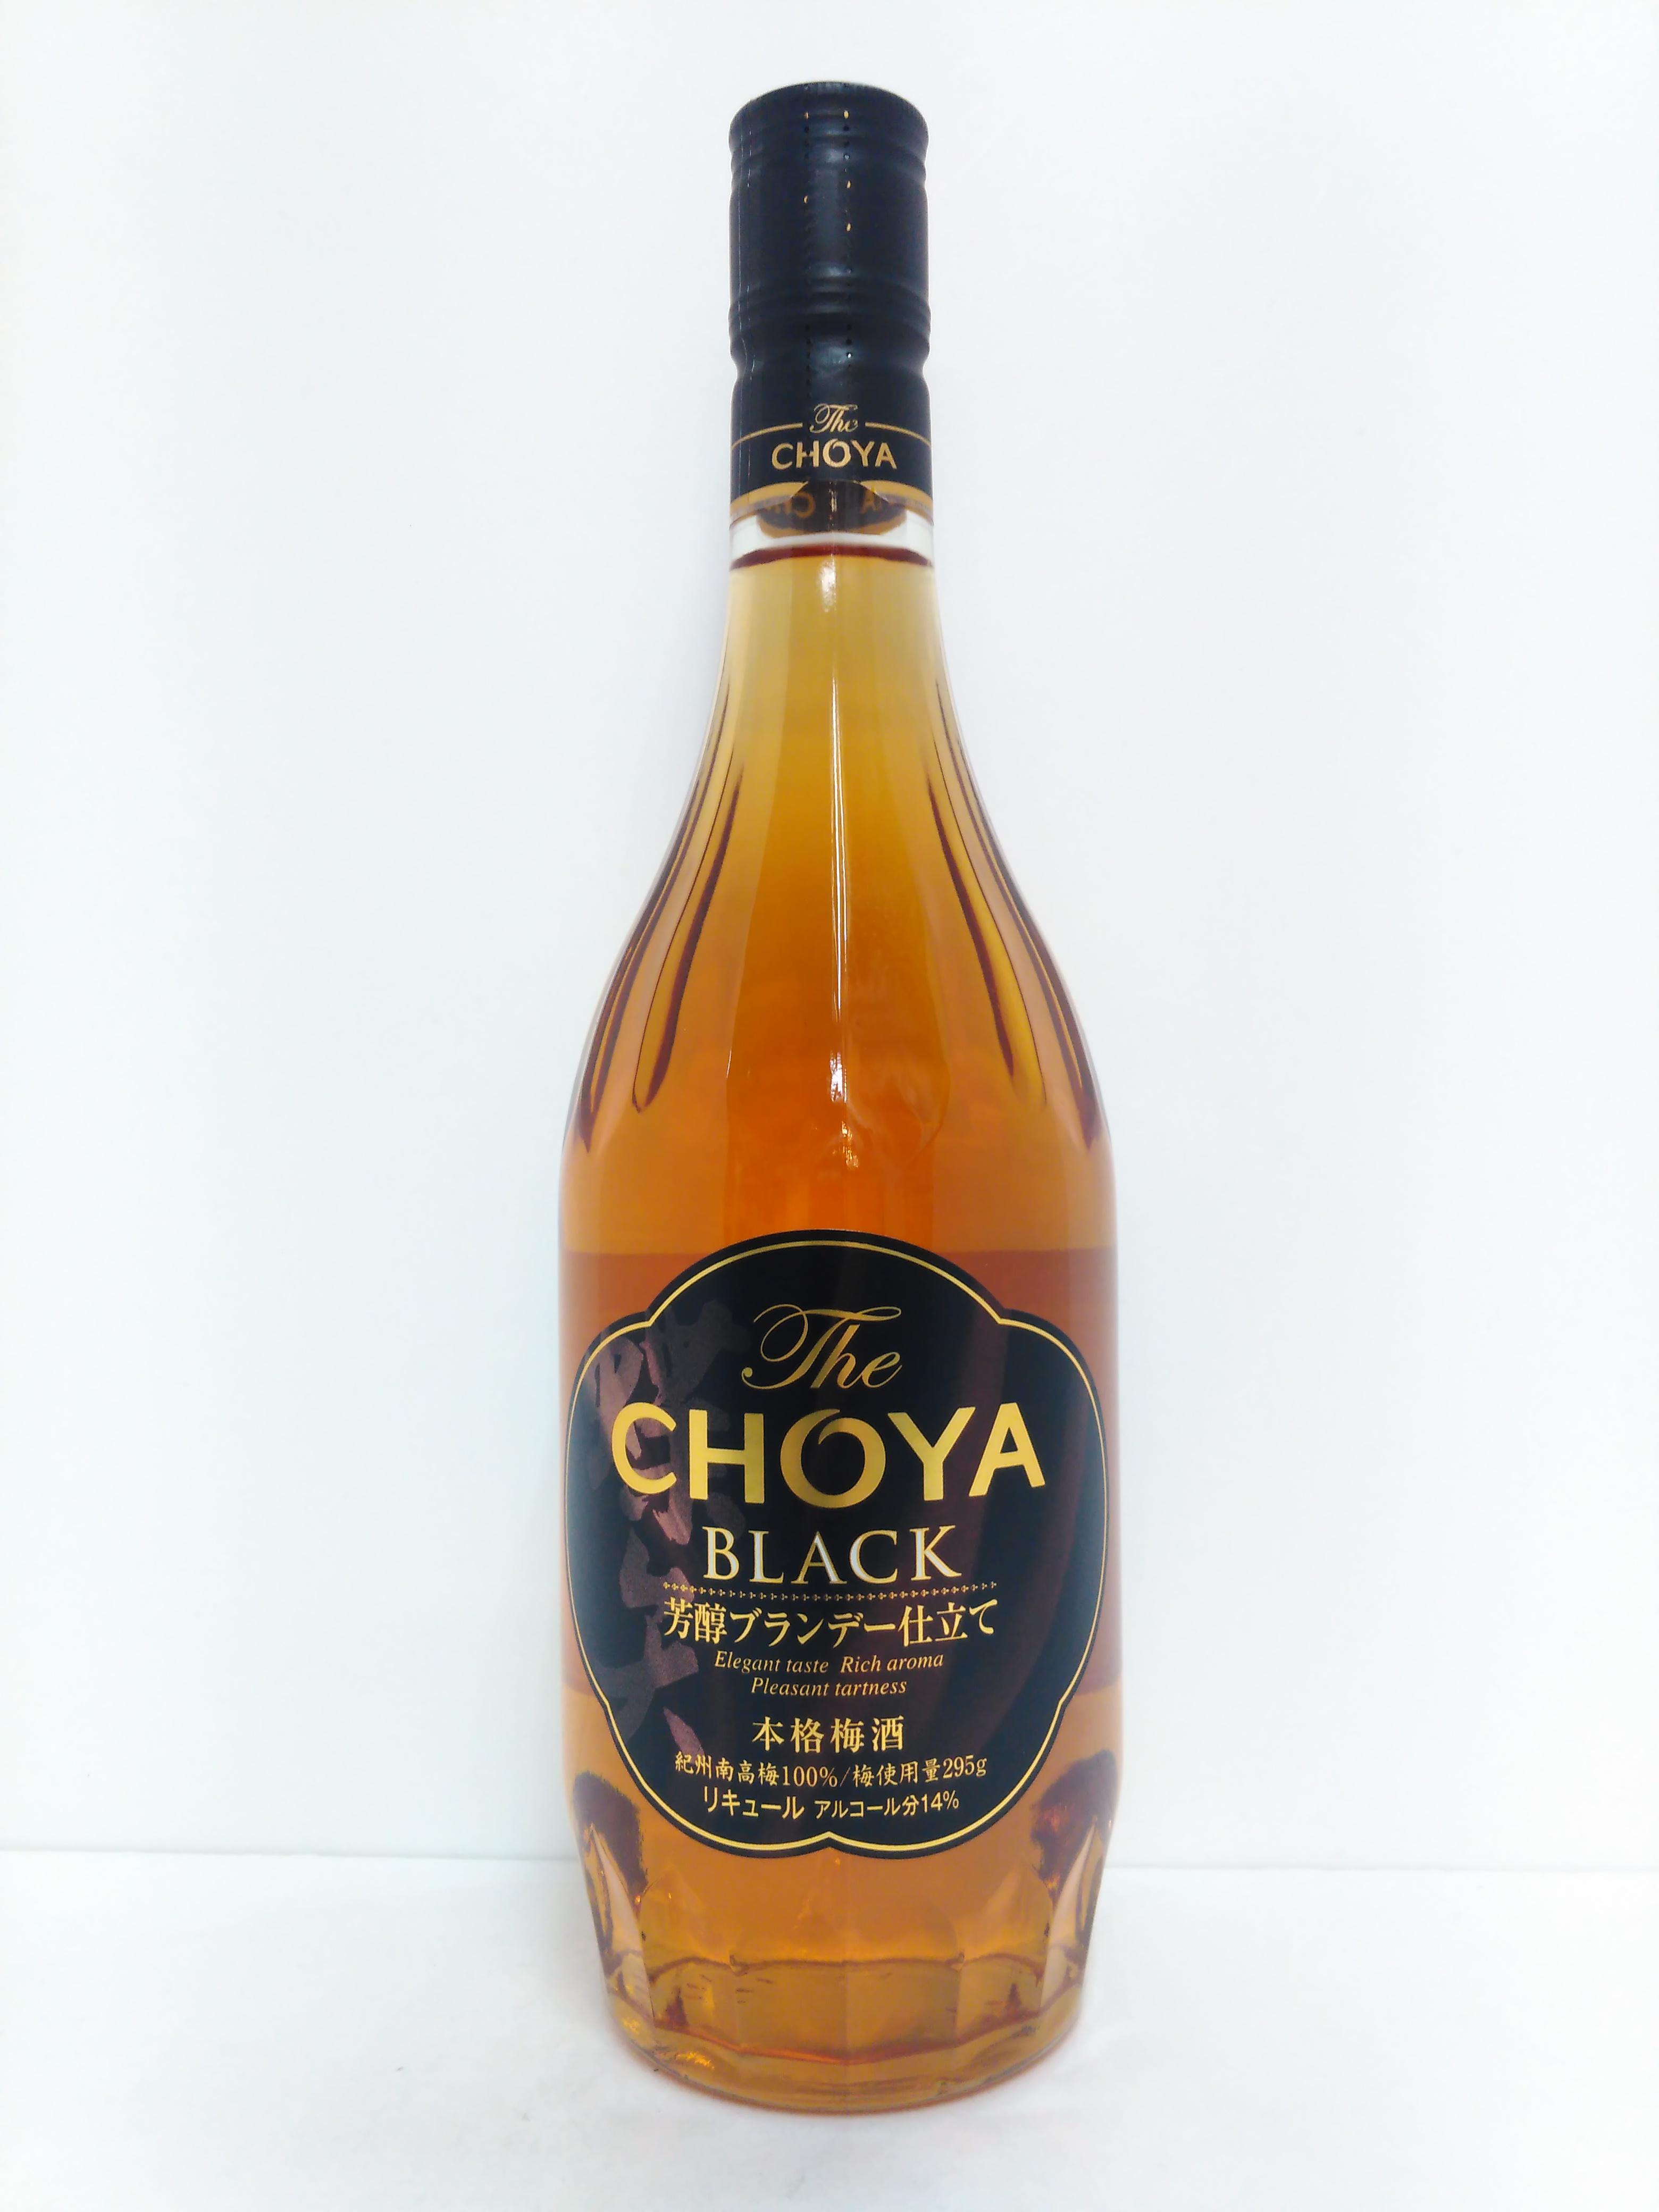 【TAKEYAスマイル便 対象品】チョーヤ梅酒 ザ・ブラック 720ml